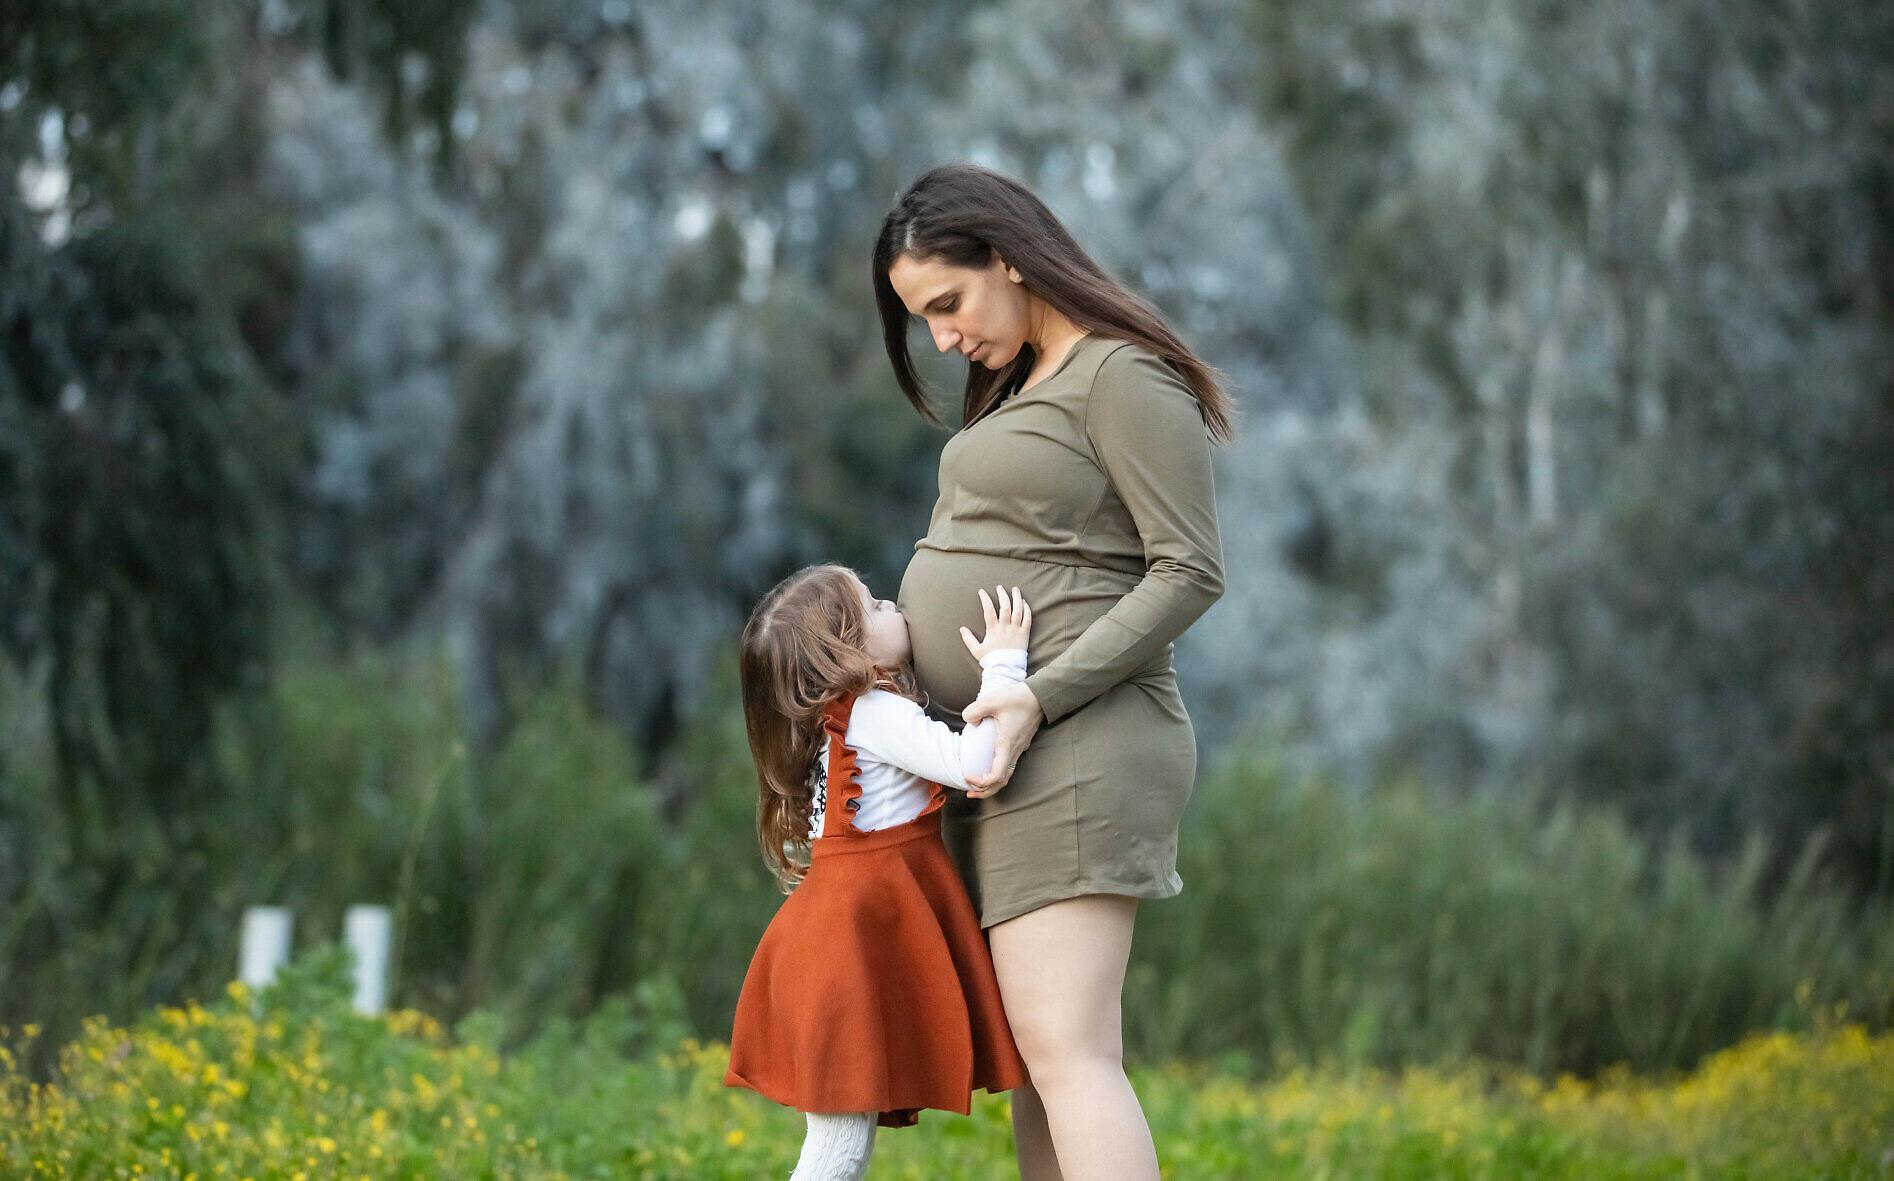 Lital Kremer, pictured a few weeks before she gave birth on April 23, 2020 (Stav Blank)